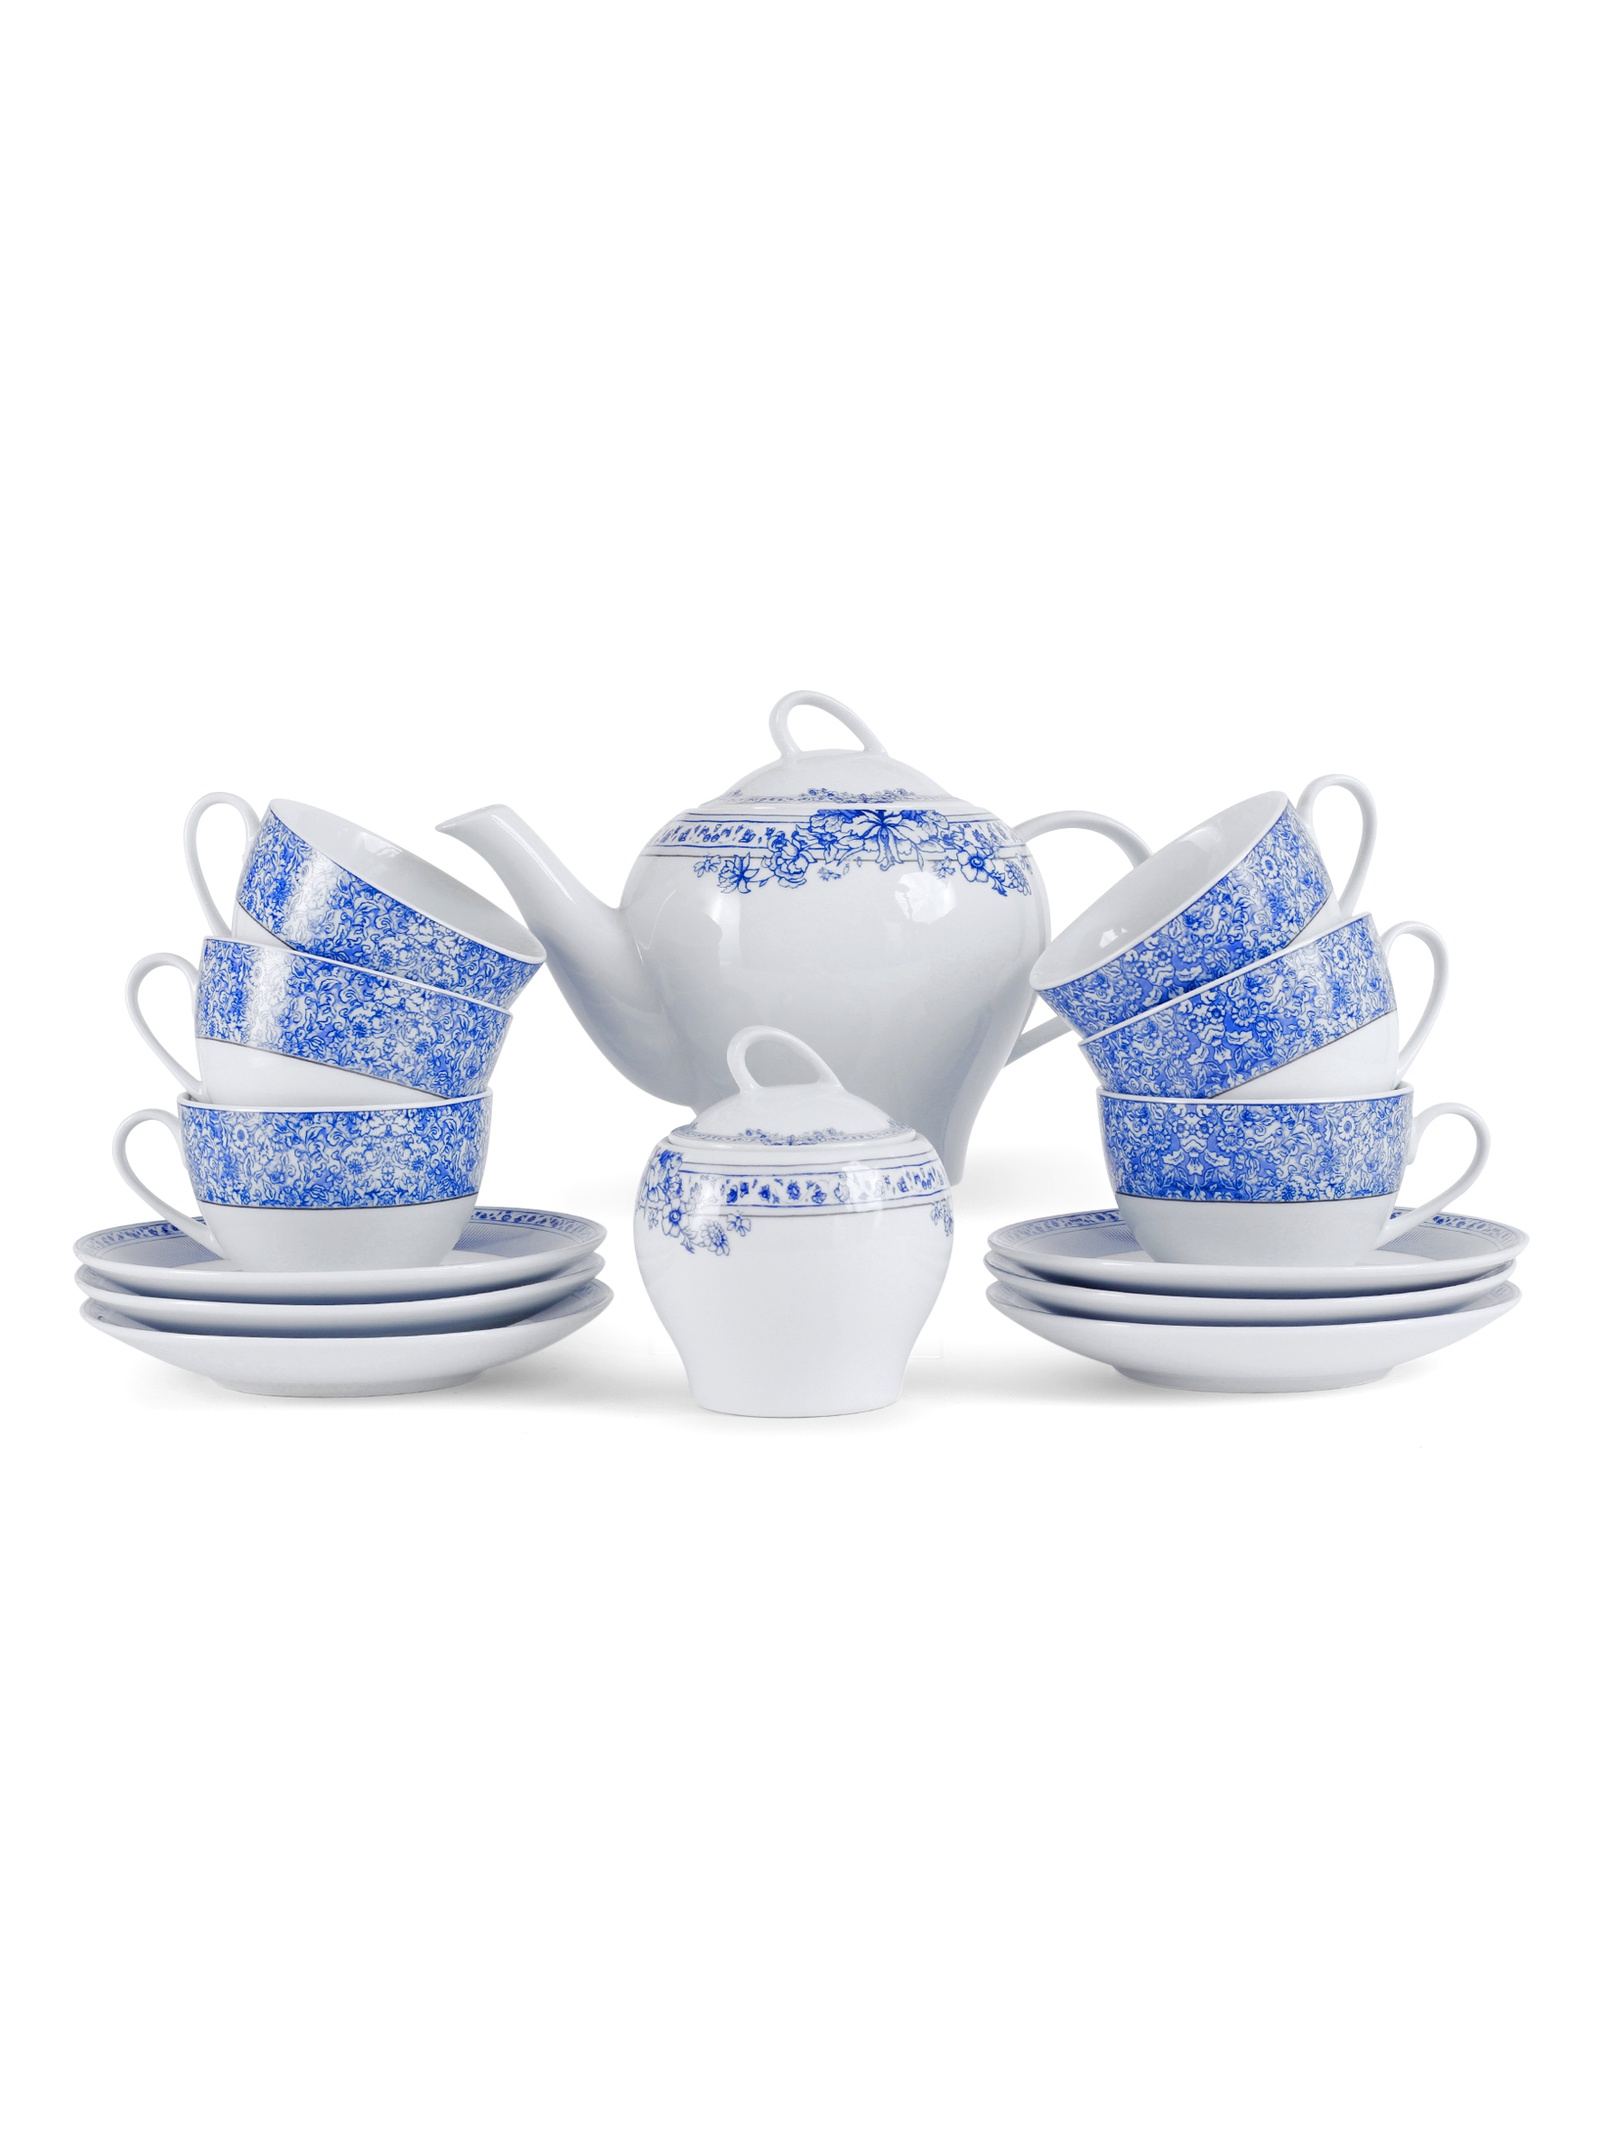 Набор чайный JEWEL Танриз синий 14 предметов (фарфор), 2 шт/уп набор чайный 12 пр синий павлин 250 мл под уп 968992 page 2